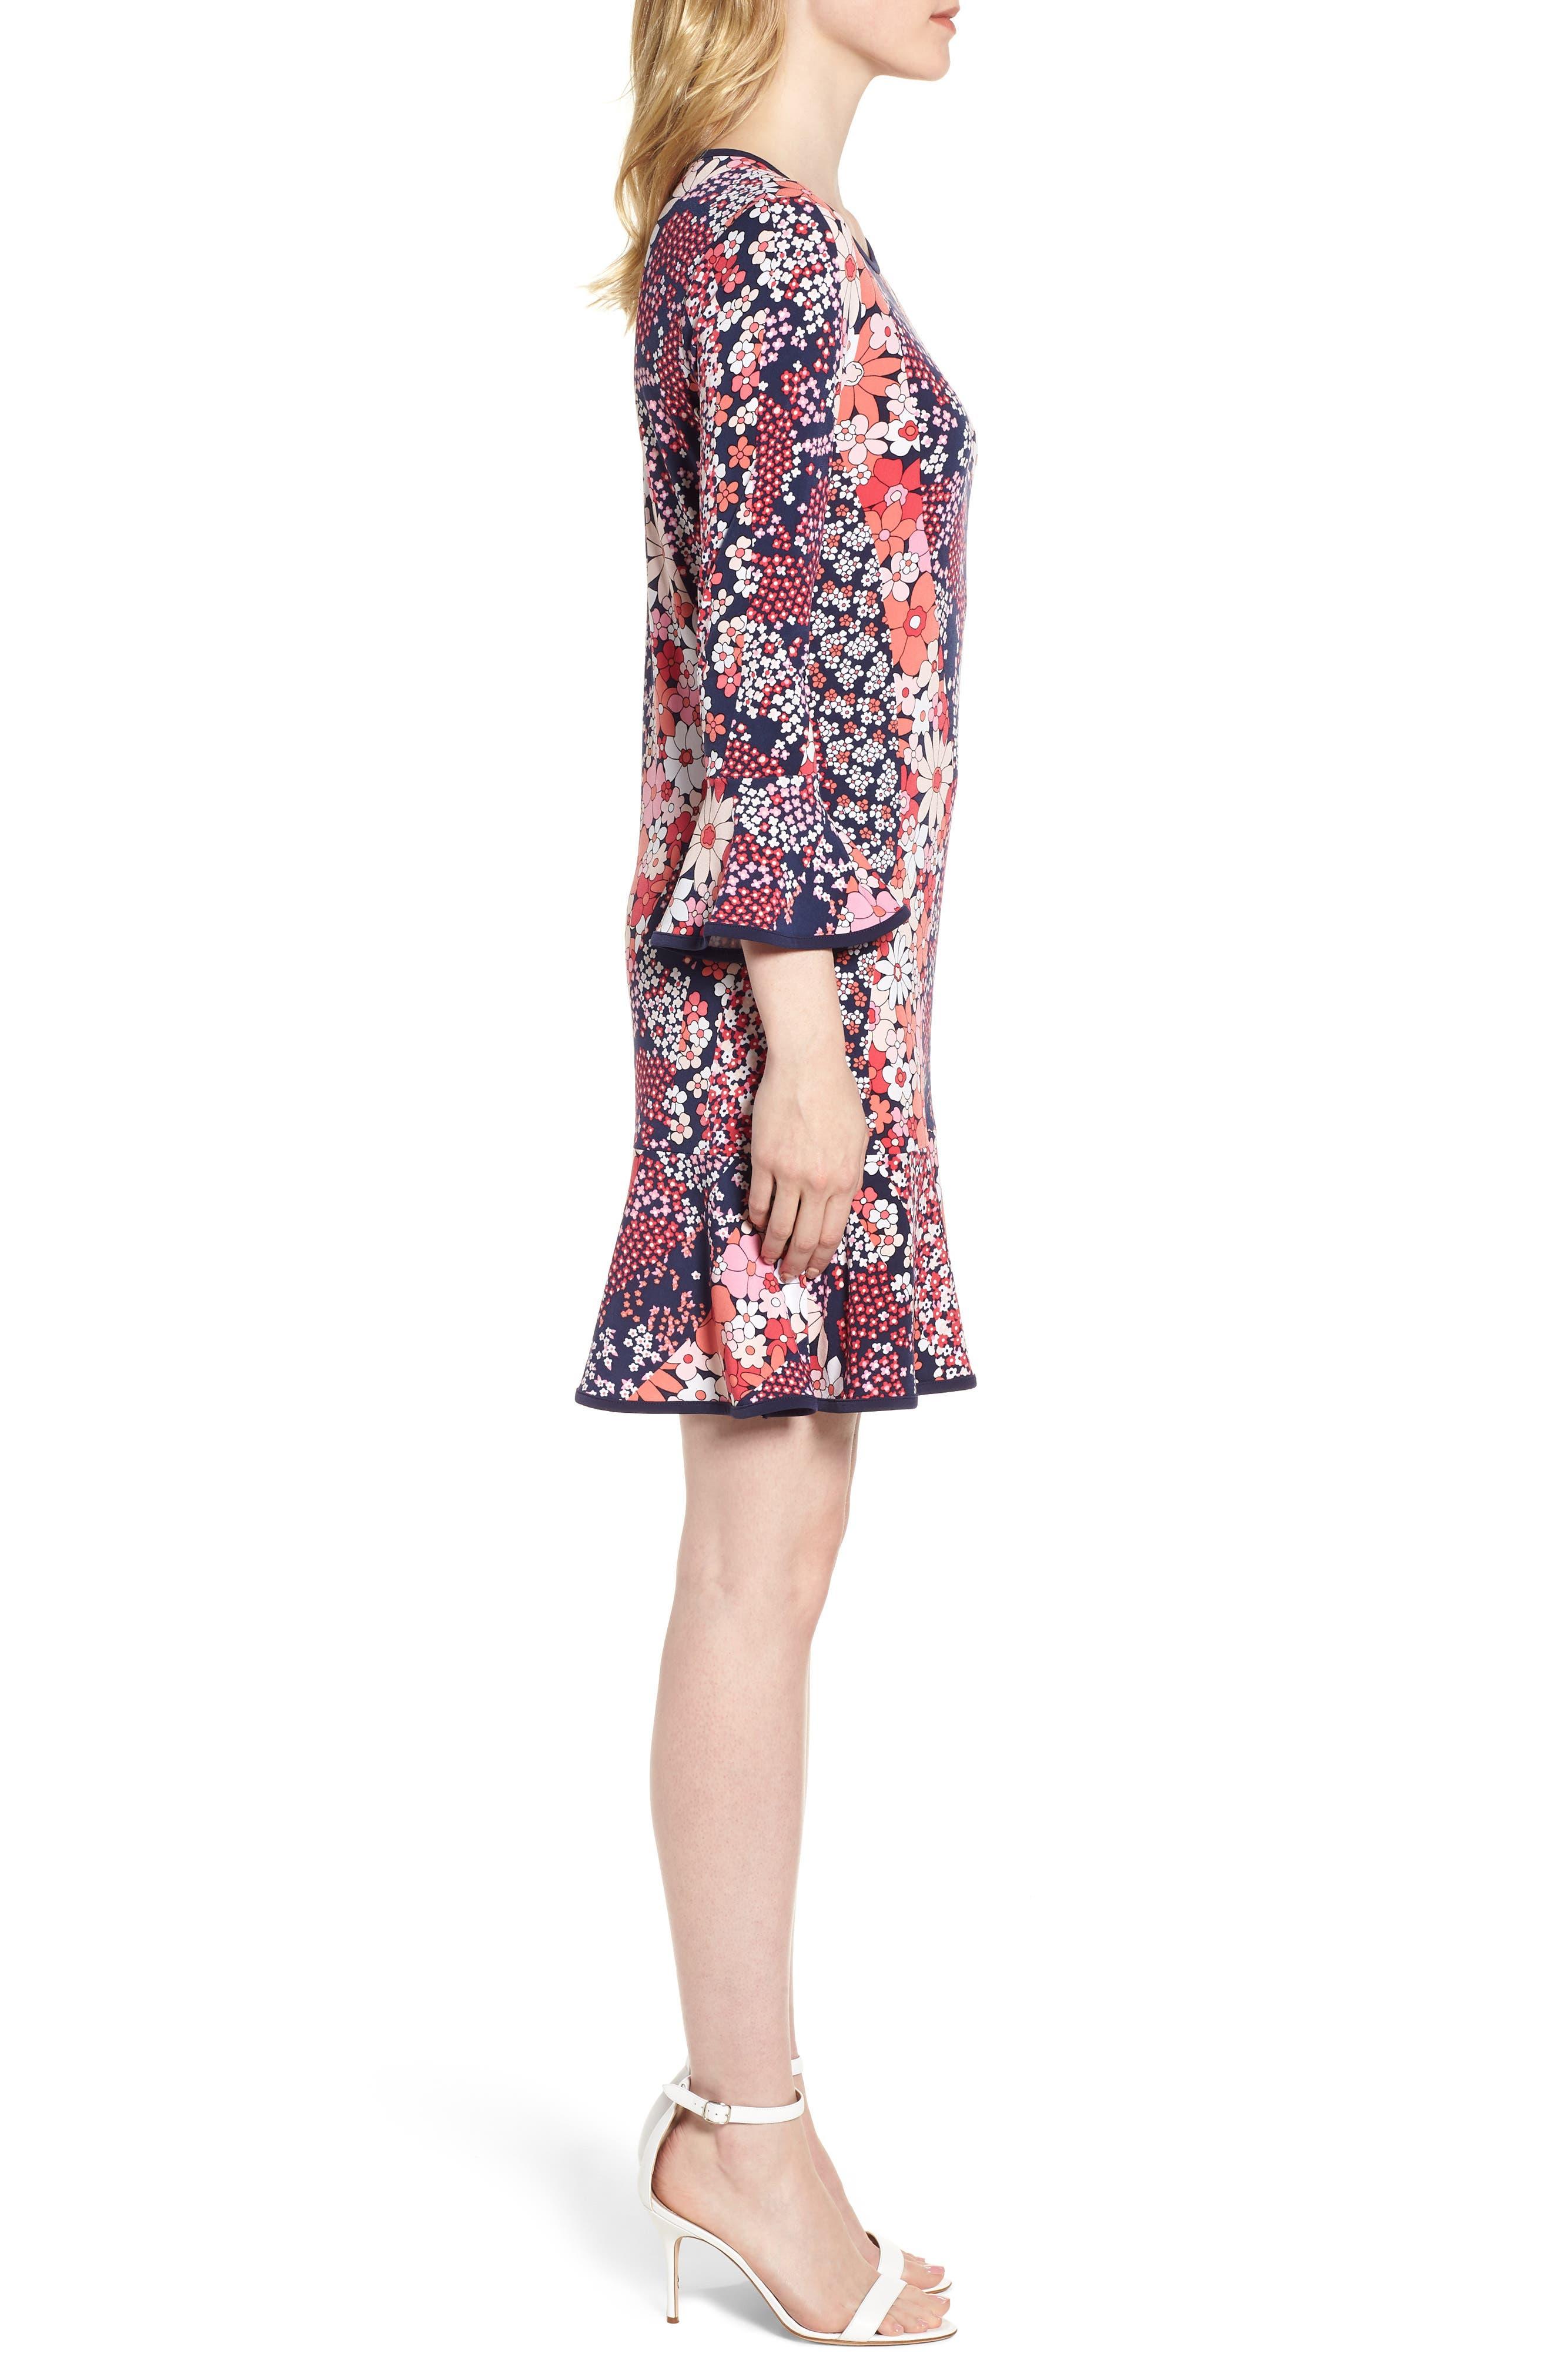 Patch Flower Flounce Dress,                             Alternate thumbnail 5, color,                             True Navy/ Bright Blush